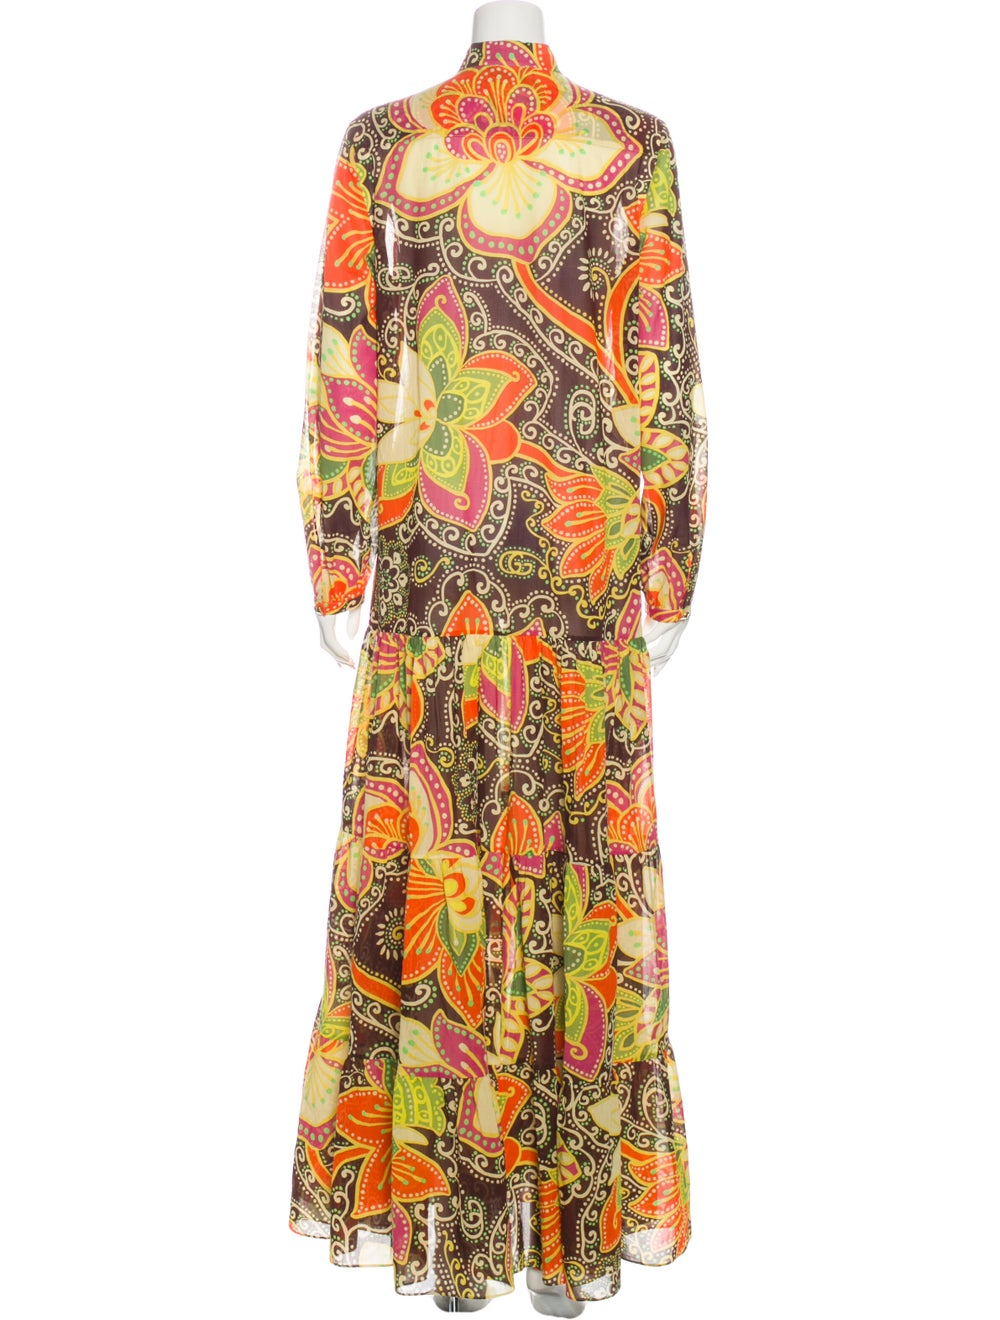 Gucci Printed Long Dress Yellow - image 3